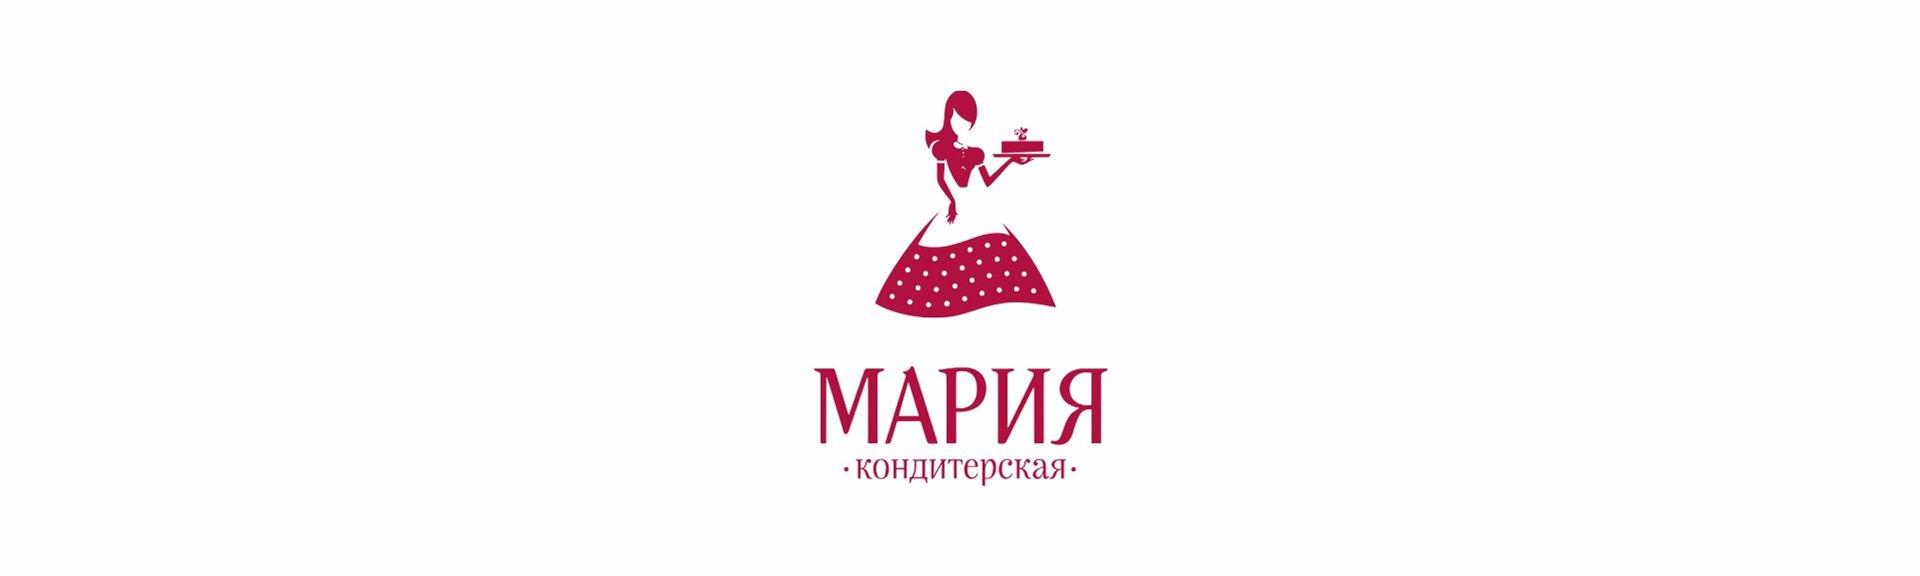 https://www.almazcom.ru/pub/img/QA/346/konditeskaya_fabrika_Mariya.jpg